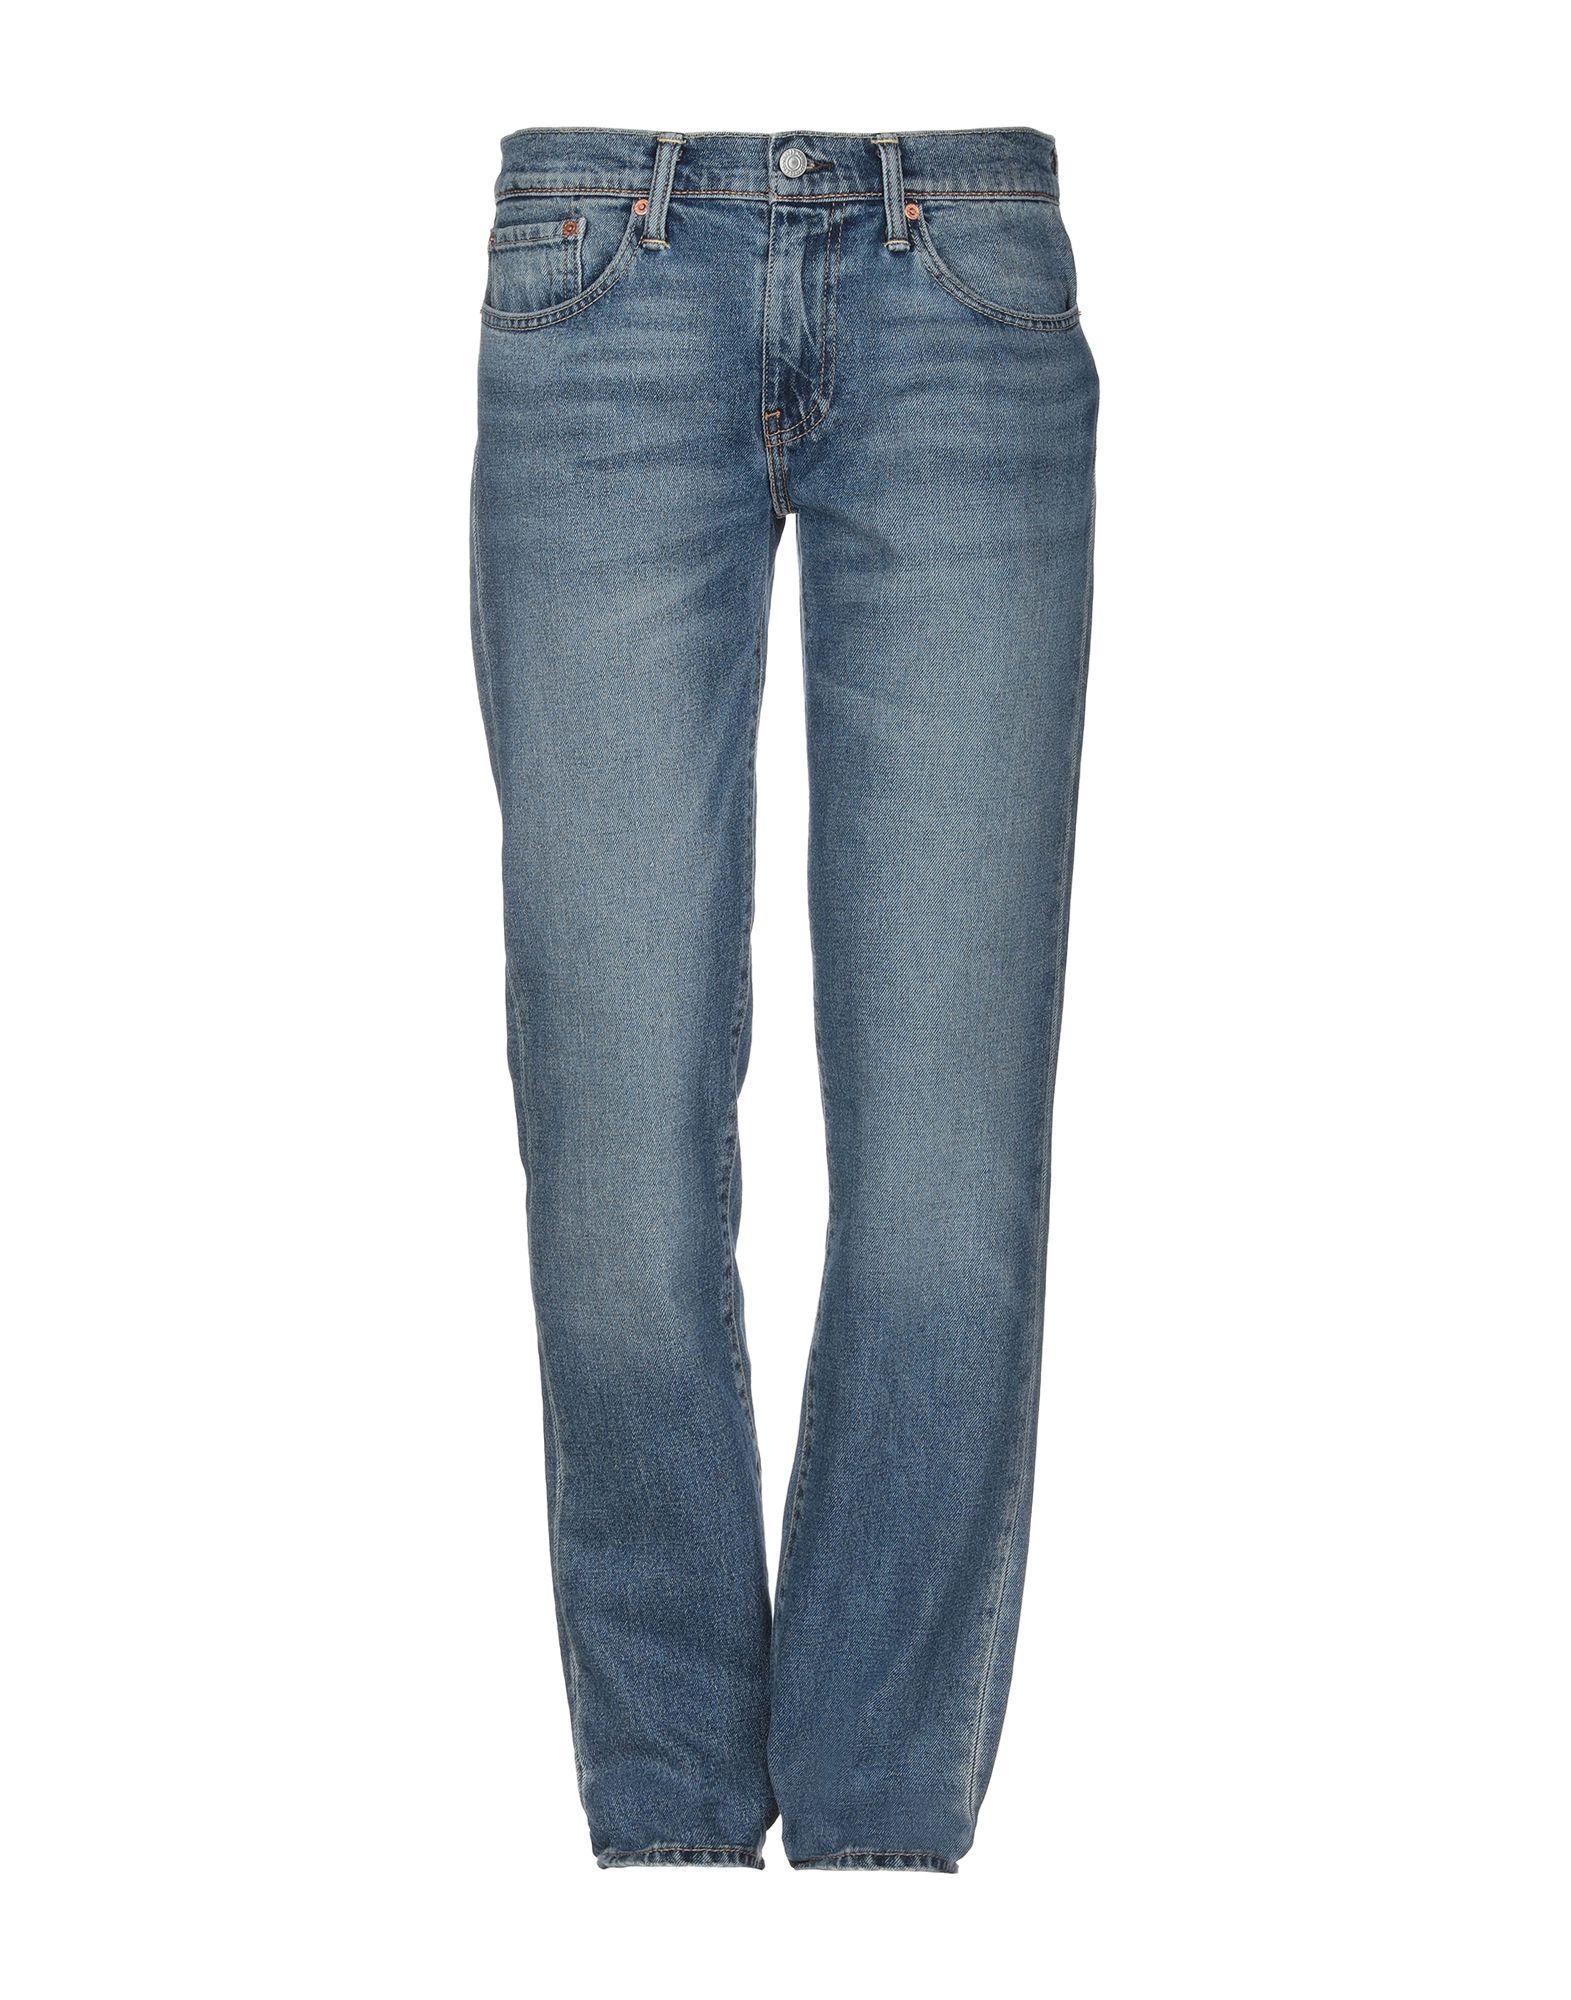 LEVI'S RED TAB Джинсовые брюки slim fit faded straight jeans